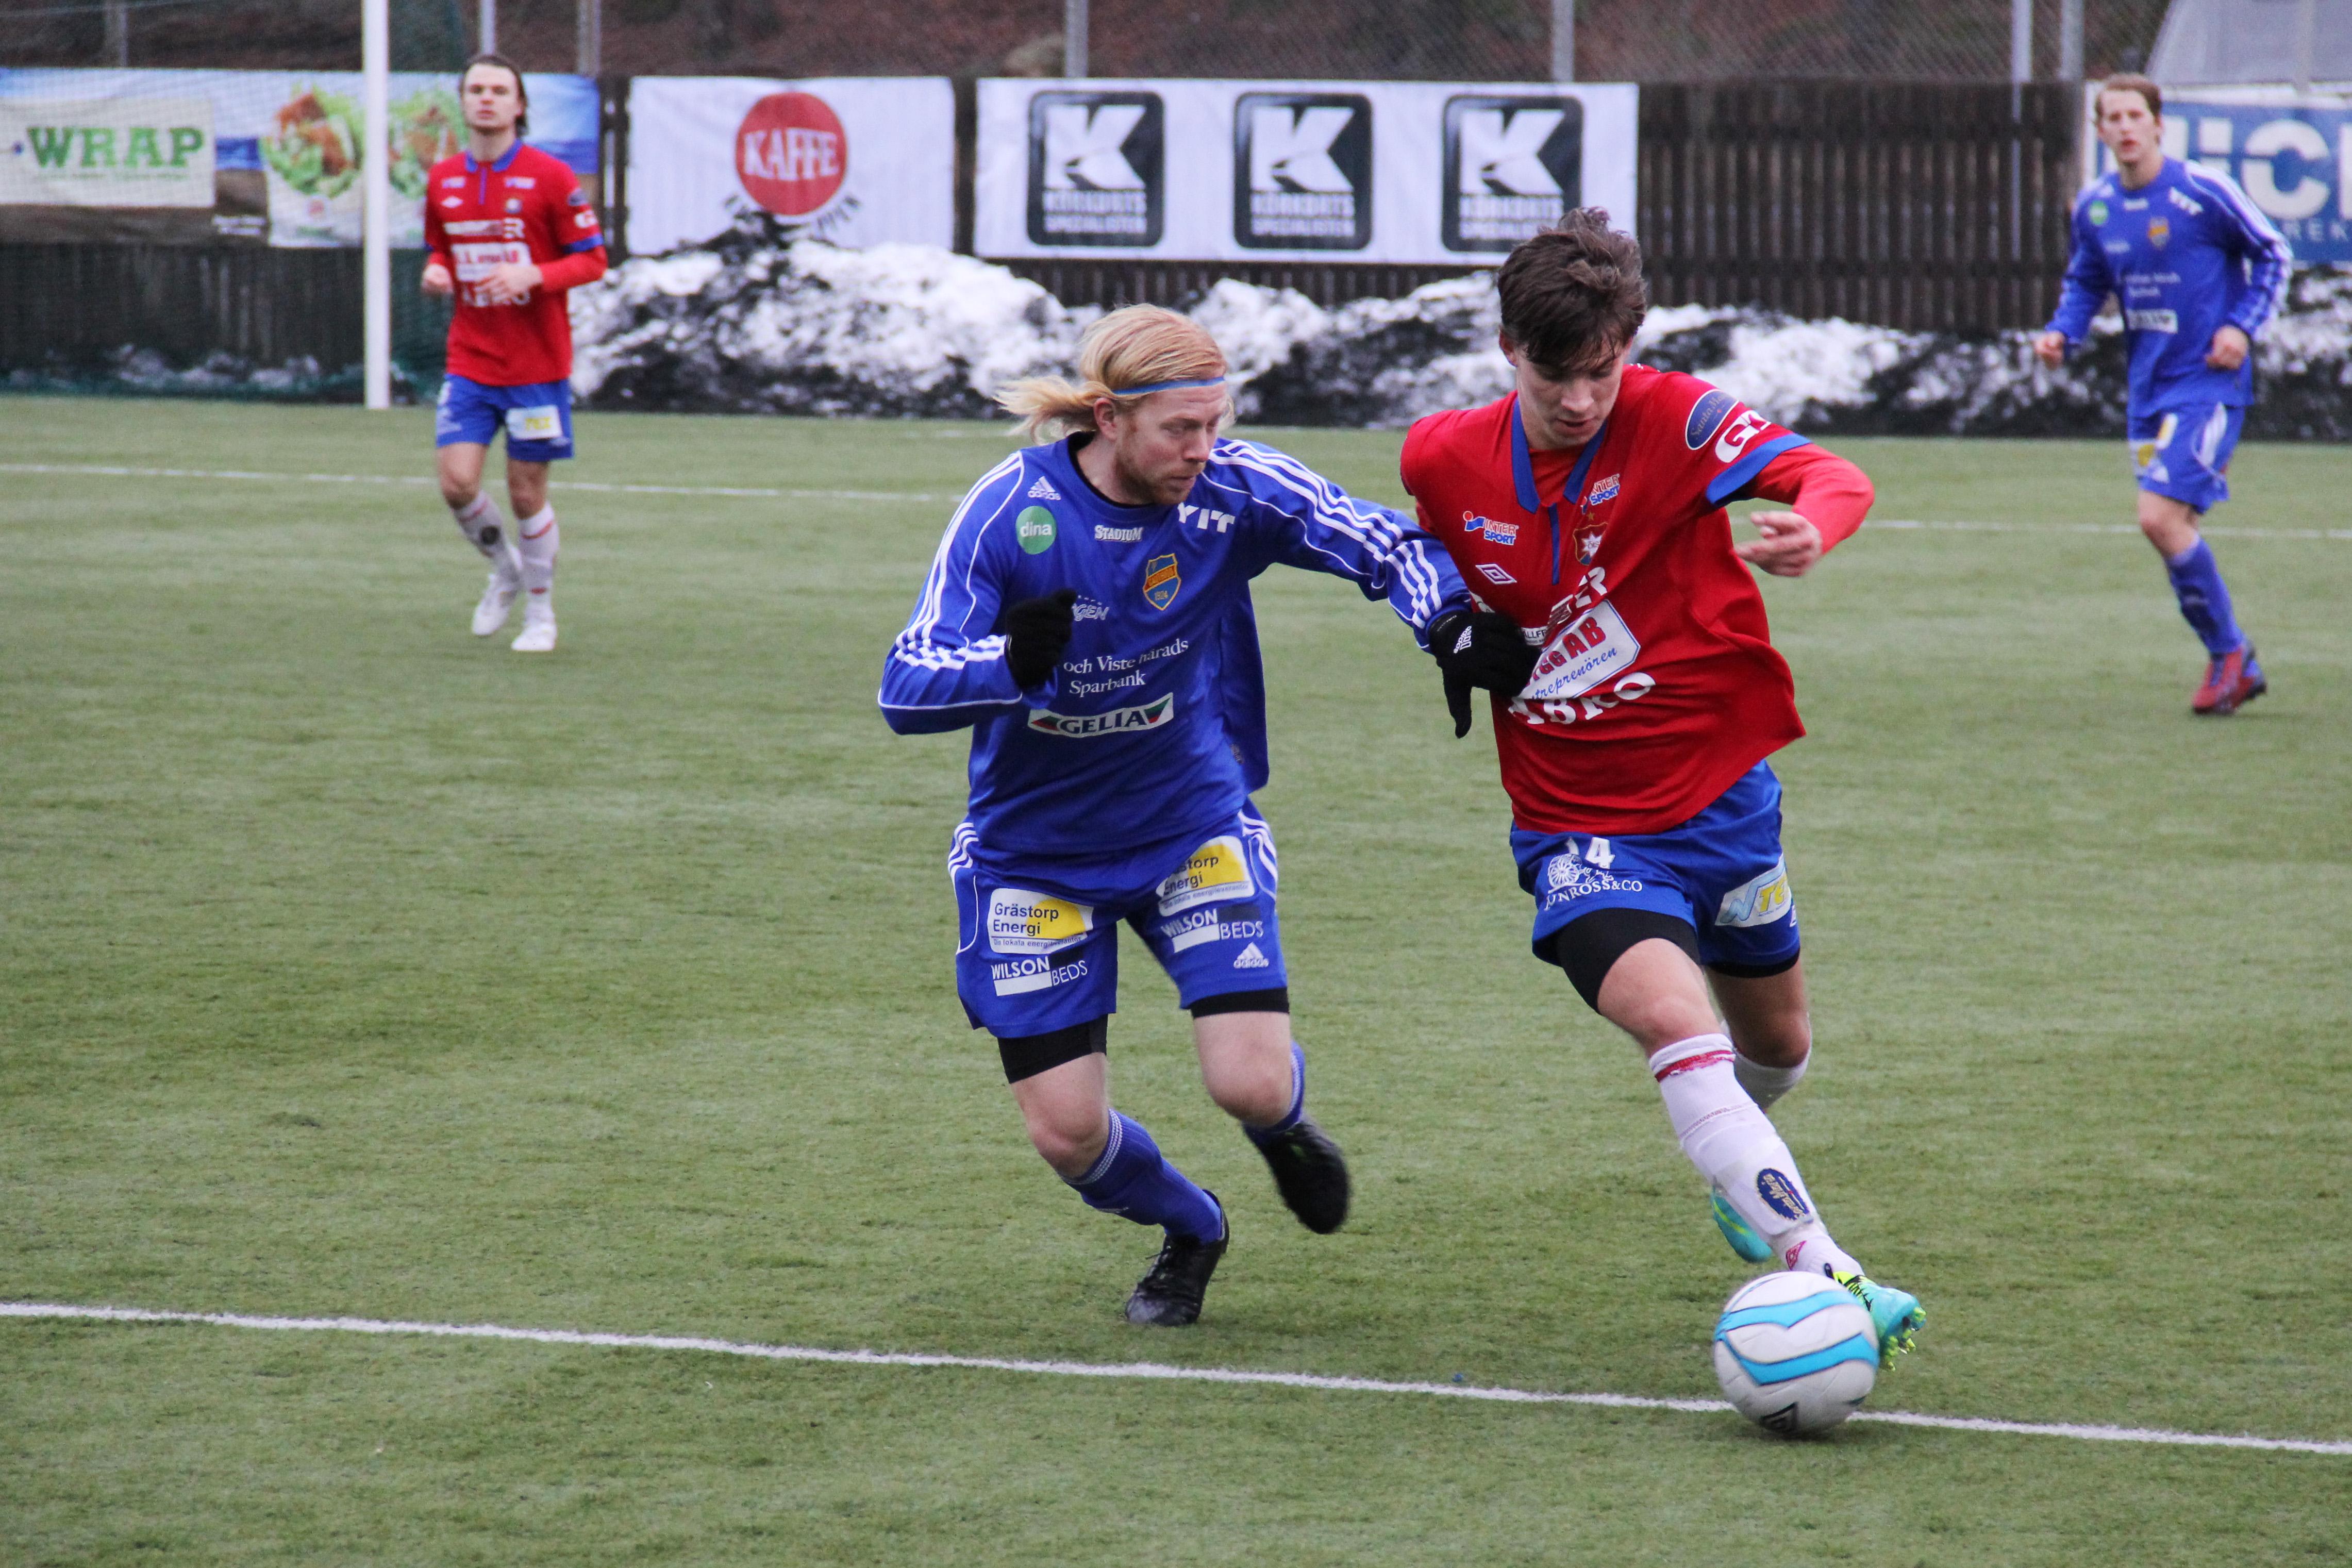 Daniel Paulsson, ÖIS-IKG, Hammarviken Arena